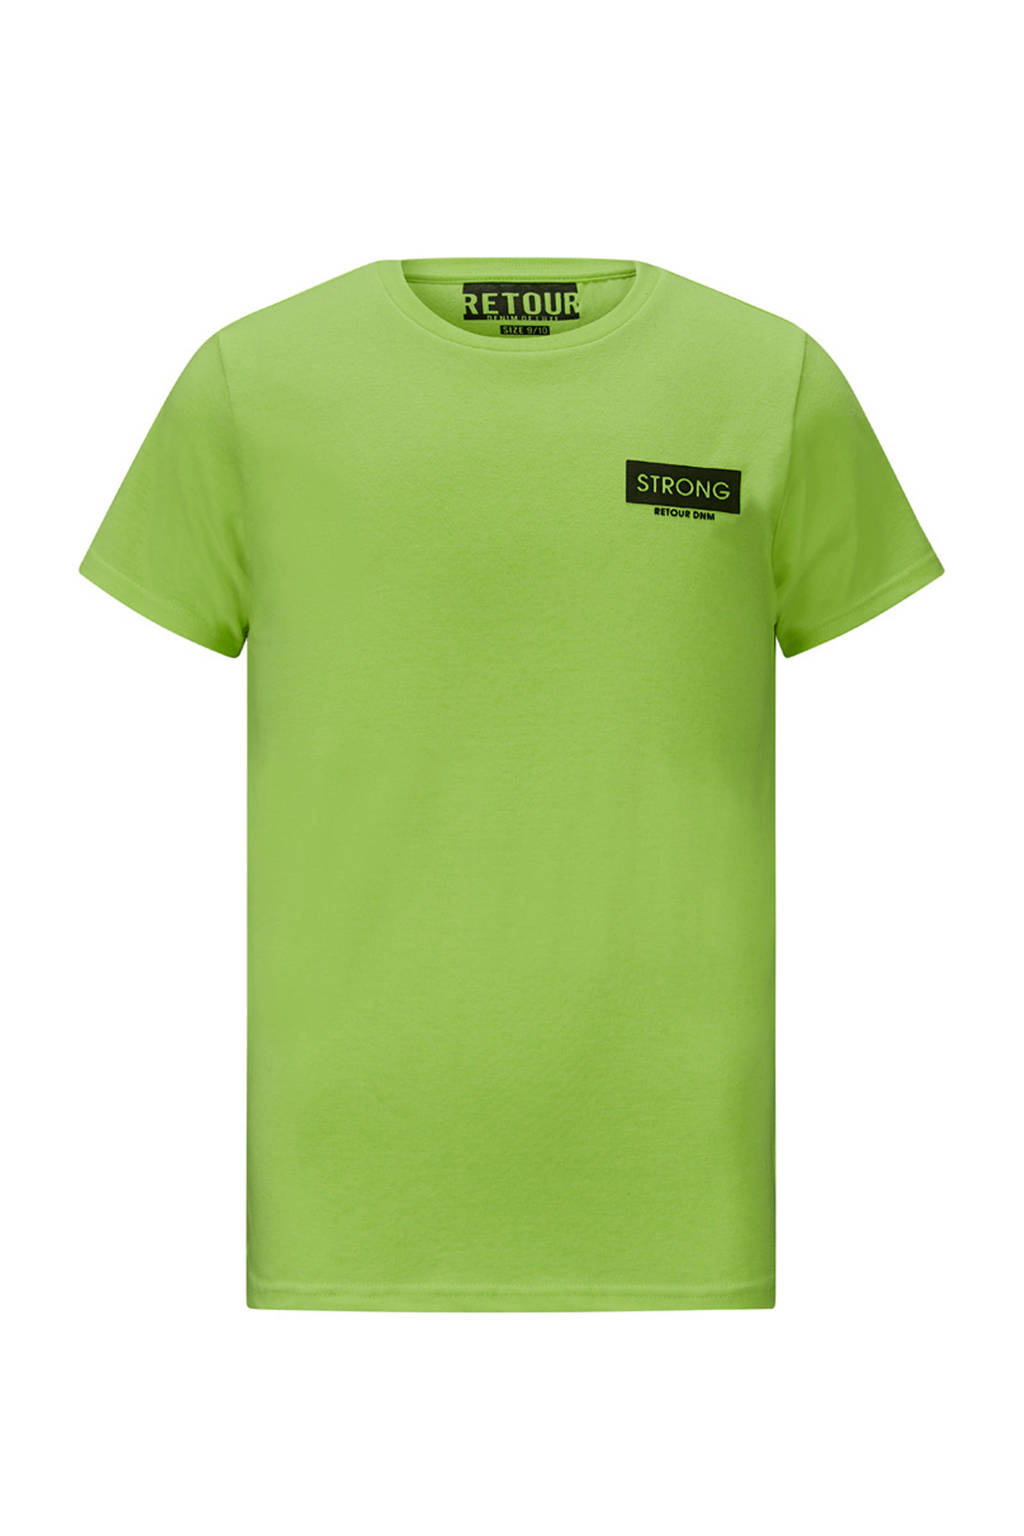 Retour Denim T-shirt Melvin met logo neon groen/zwart